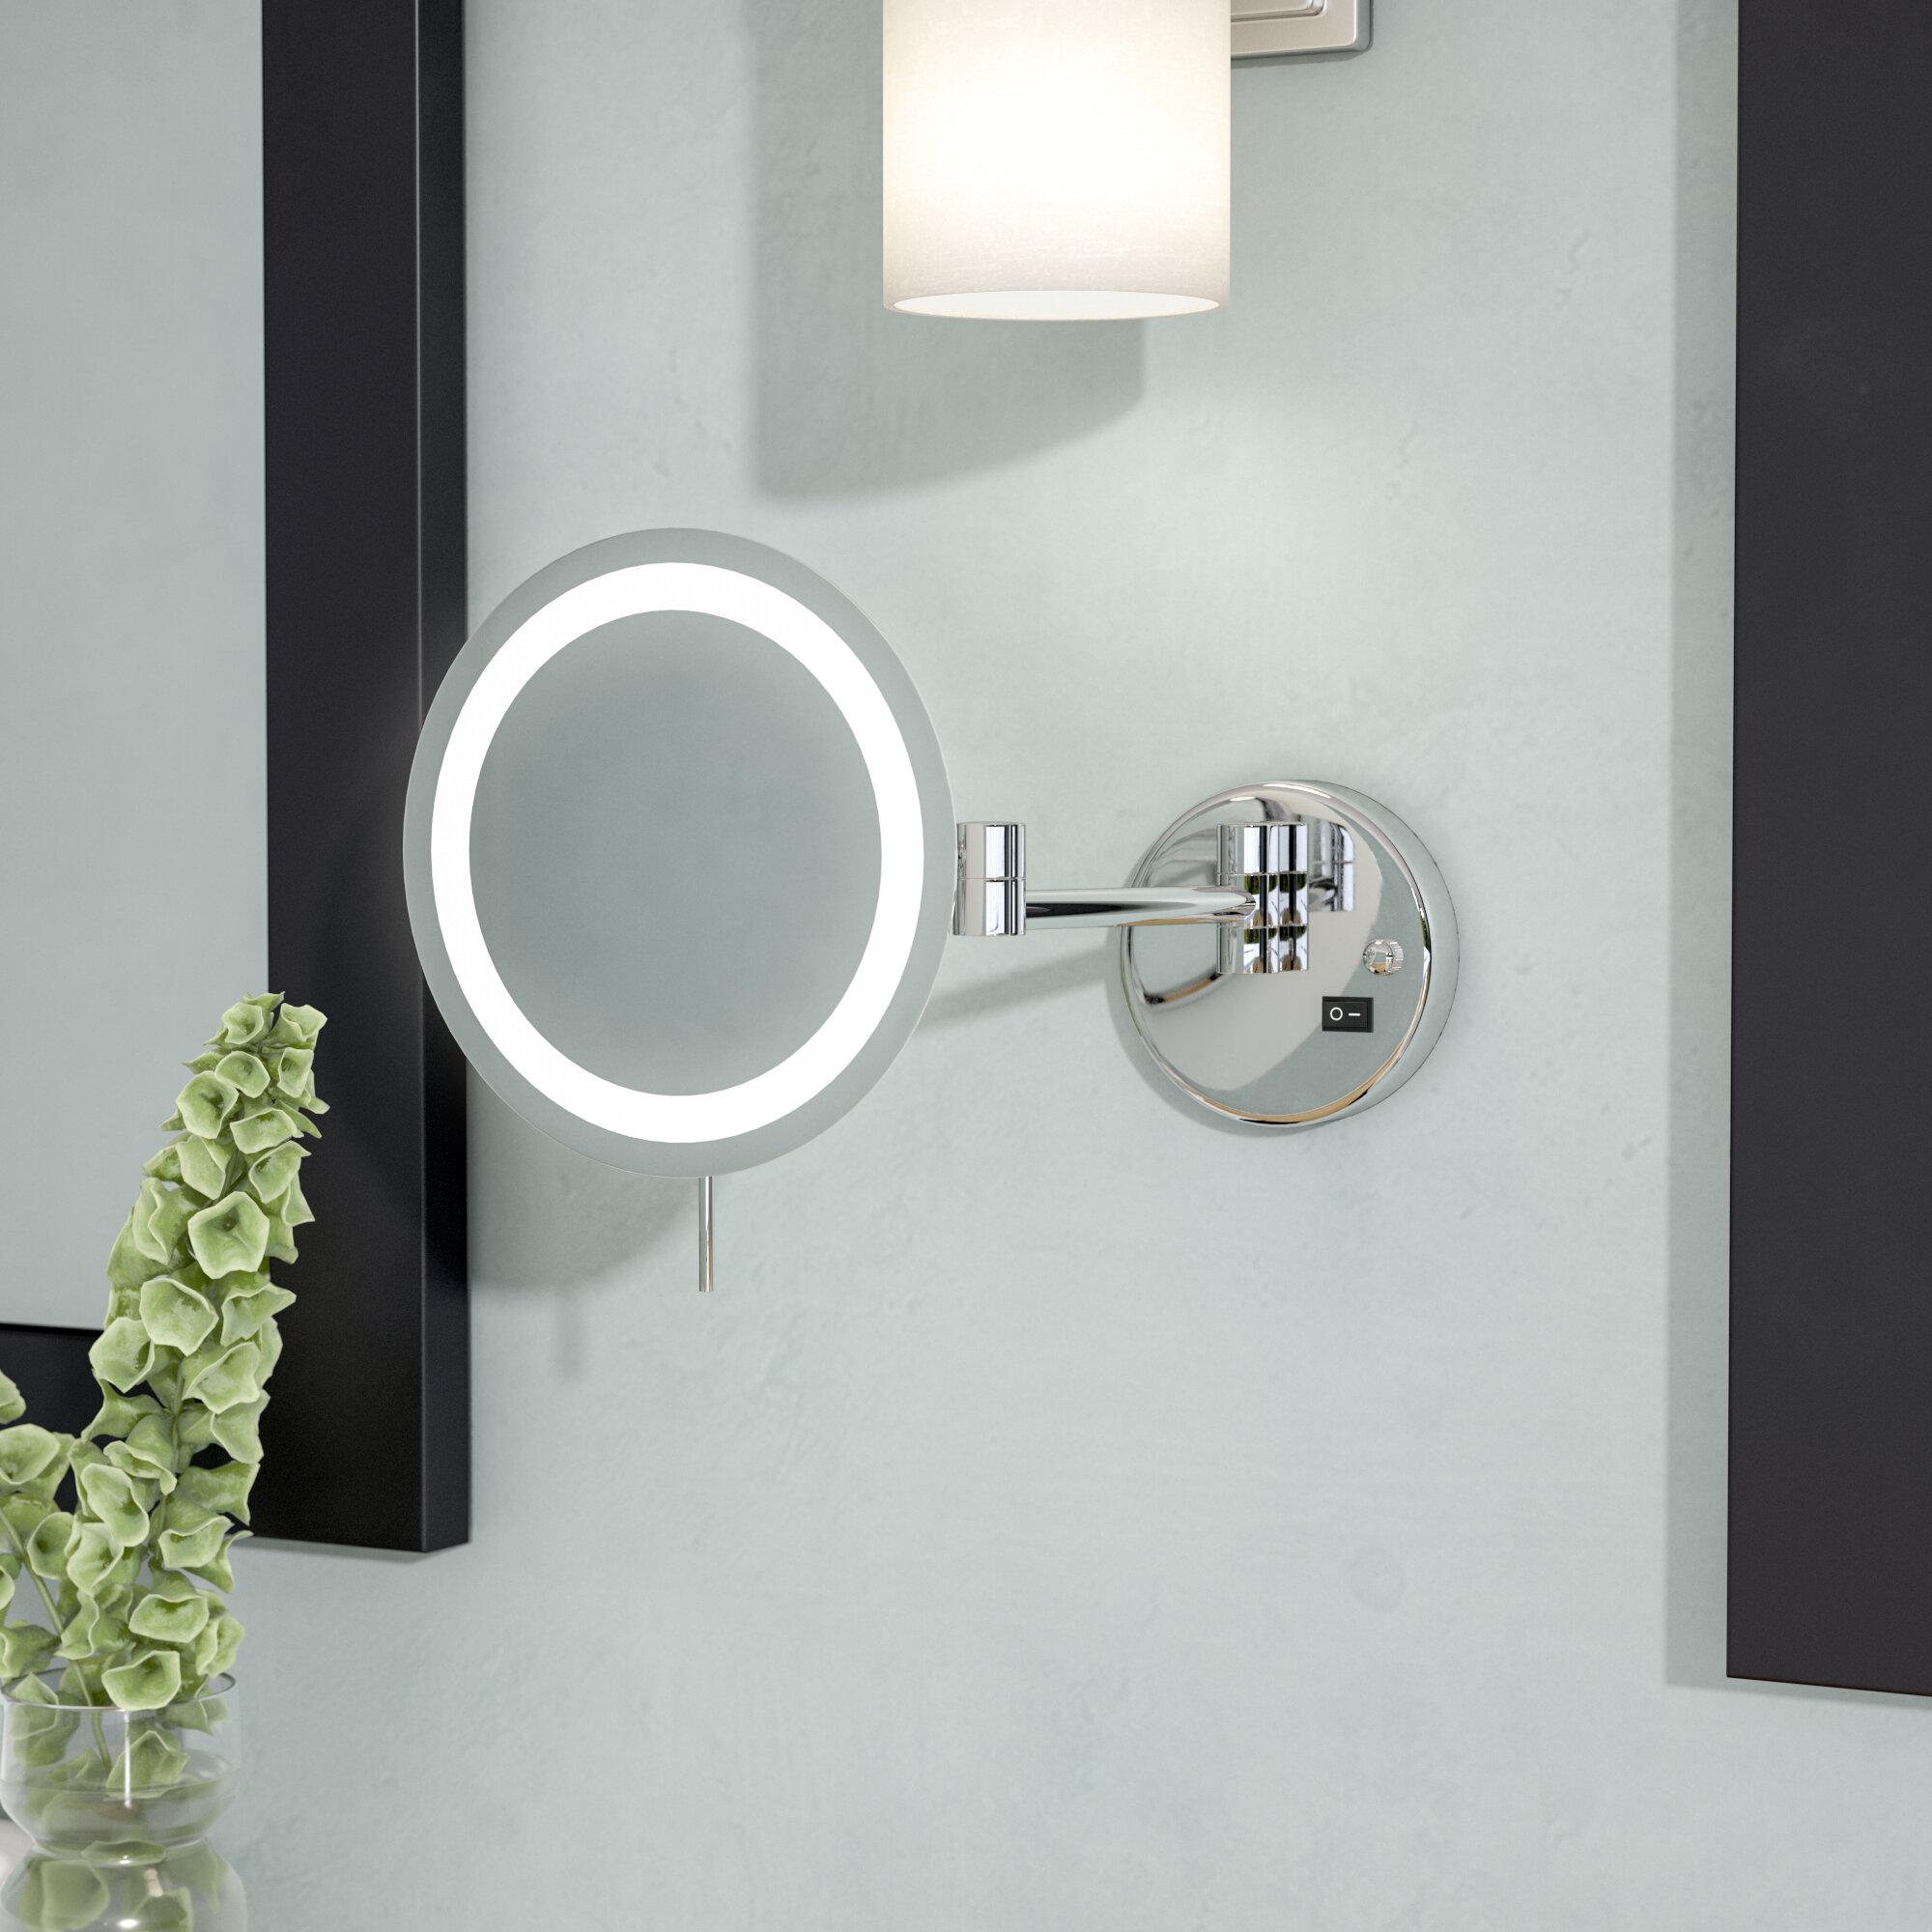 Image of: Ivy Bronx Ignacio Led 8x Magnifying Wall Mount Makeup Mirror Reviews Wayfair